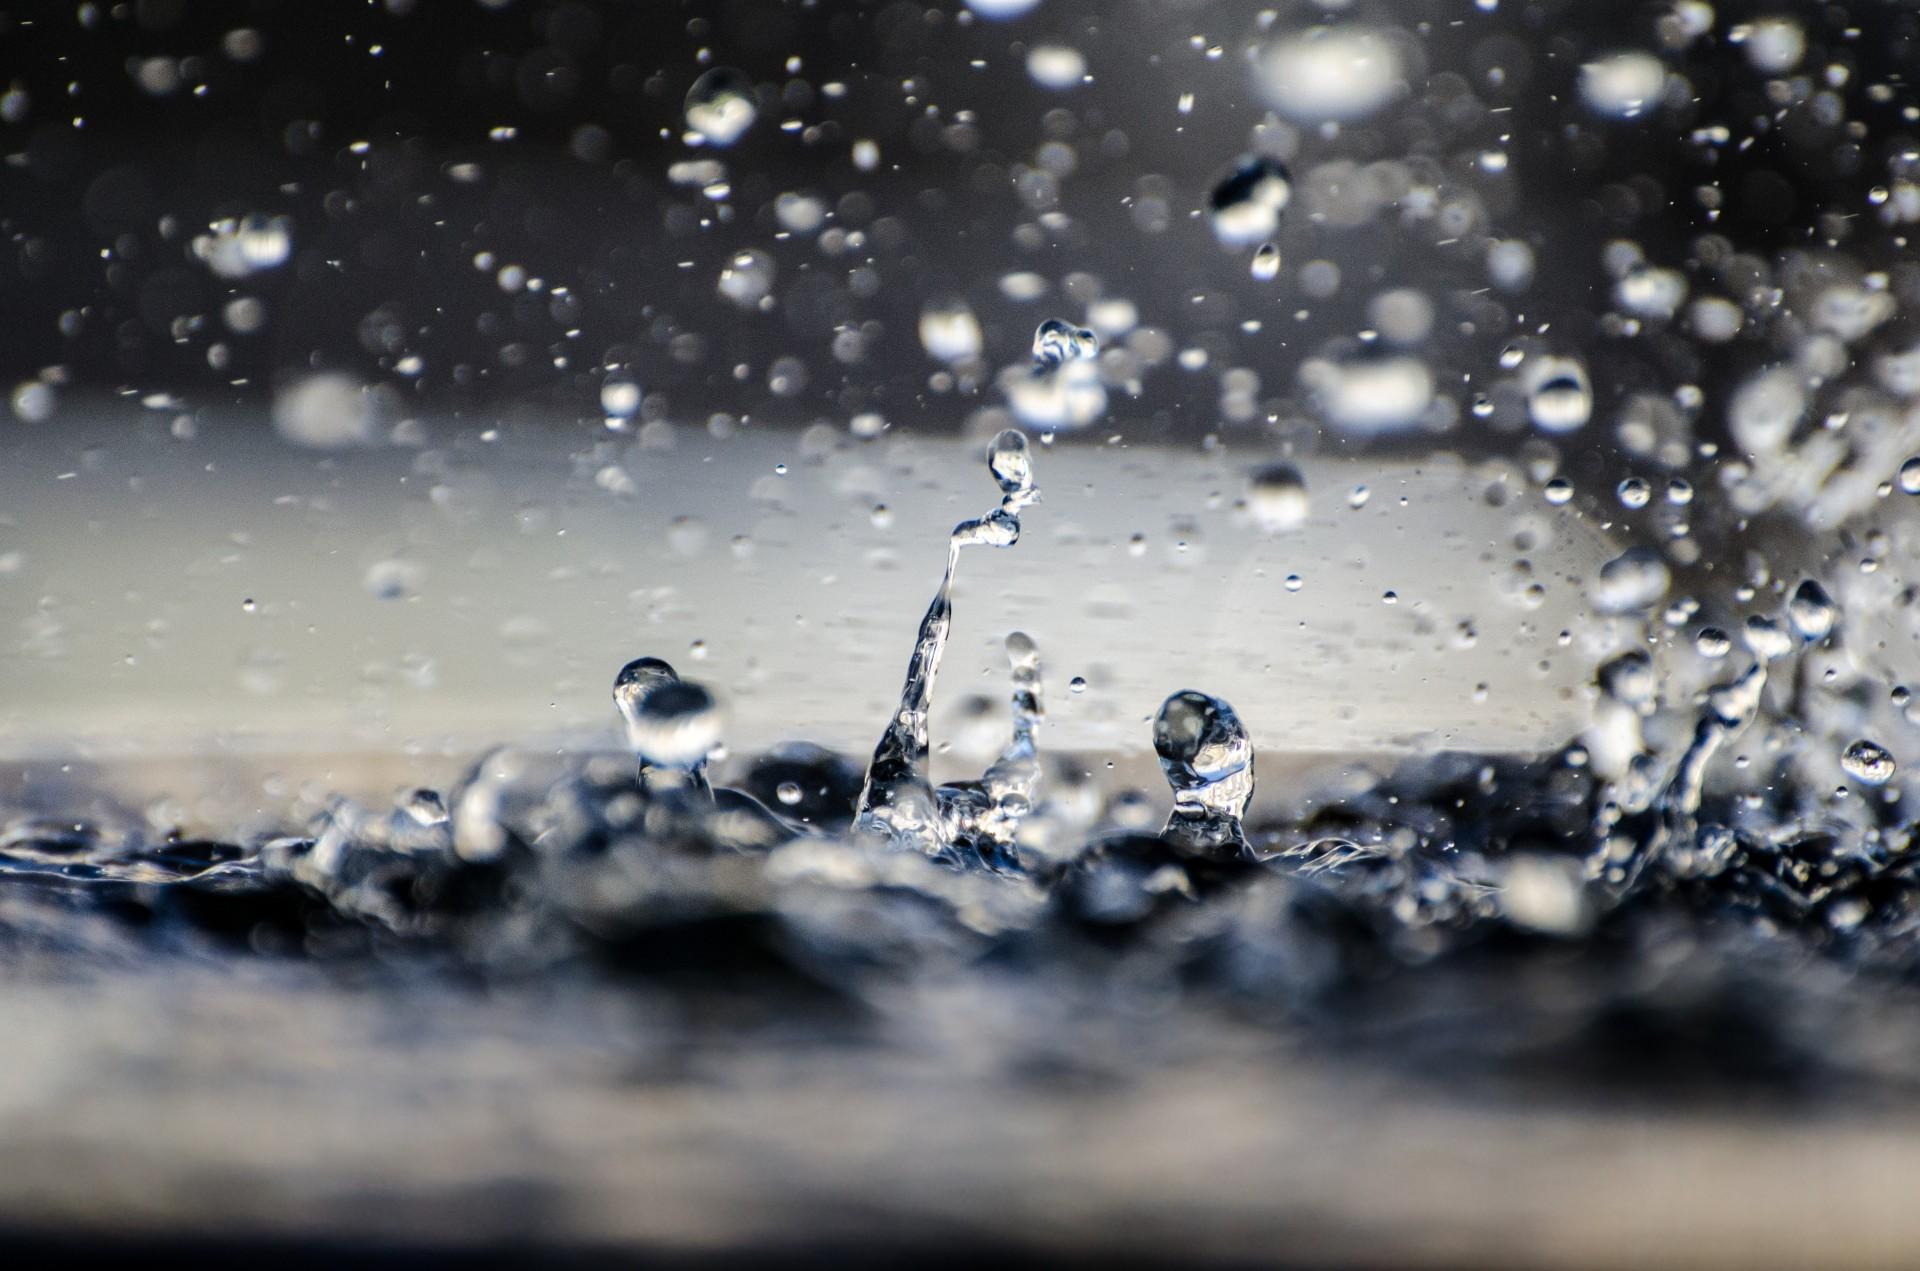 water-1373975546ODr.jpg